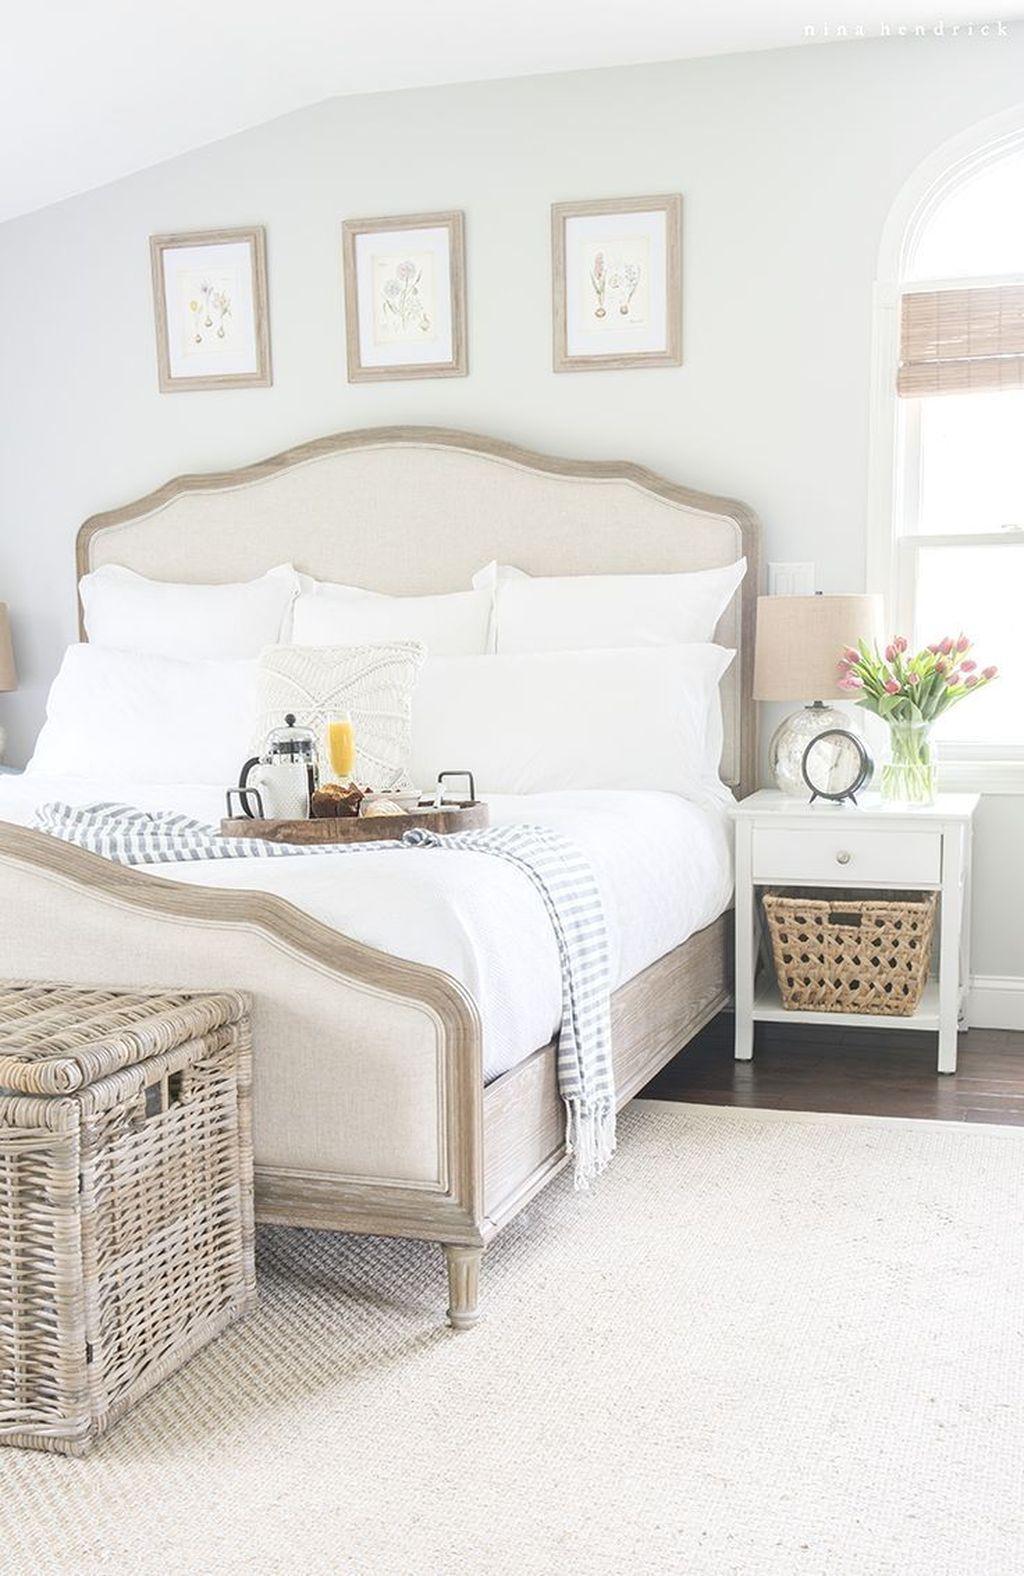 Lovely Spring Bedroom Decor Ideas Trending This Year 11